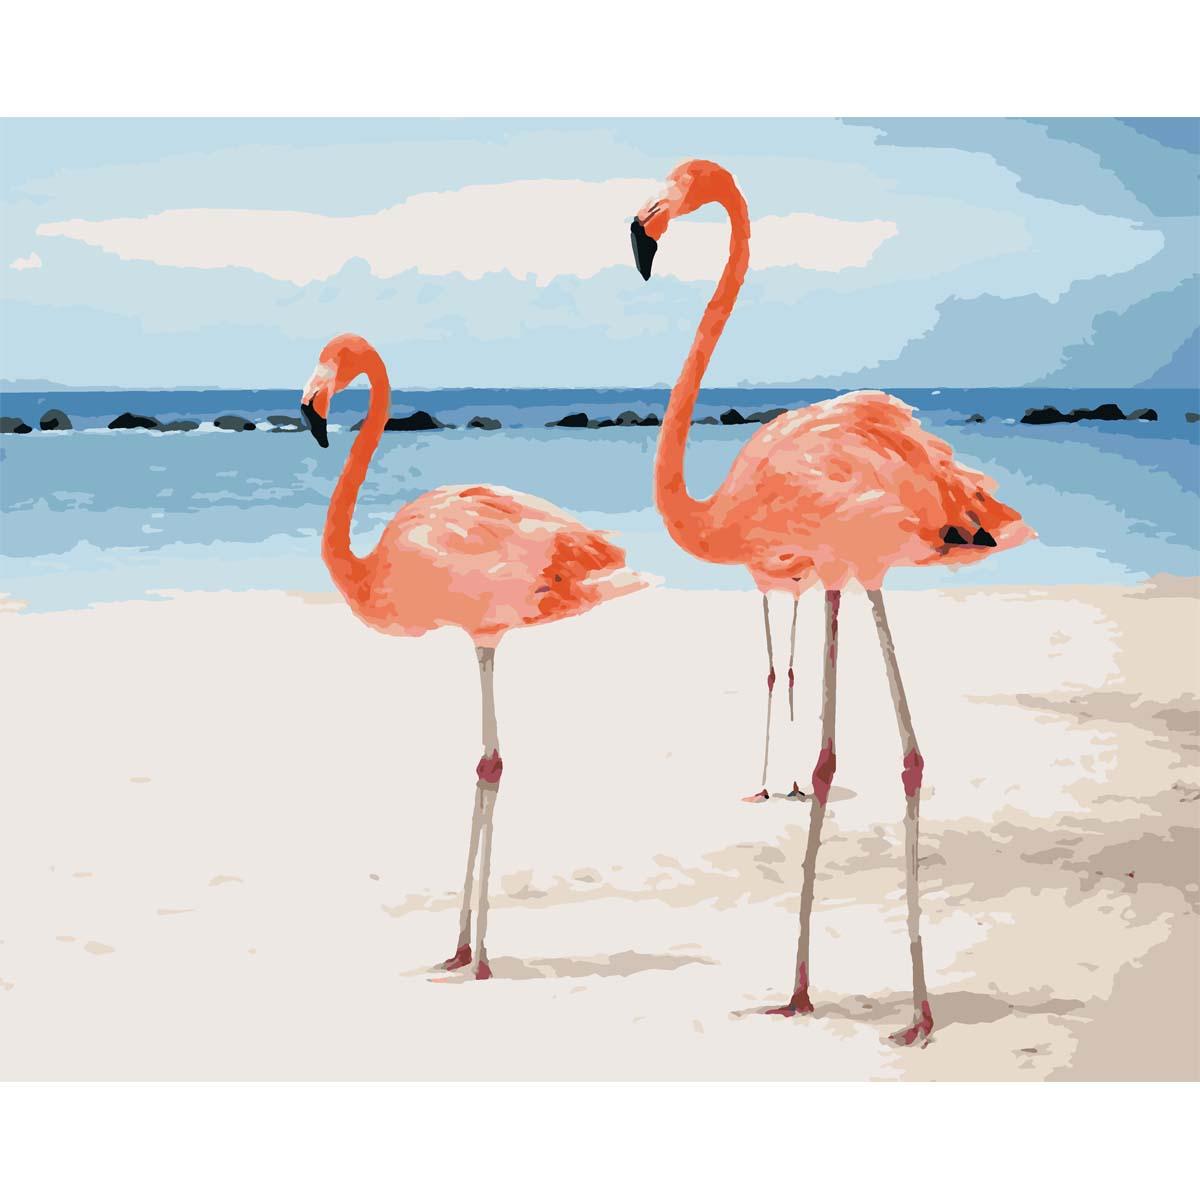 HS0220 Набор для рисования по номерам 'Парочка фламинго на берегу' 40*50см